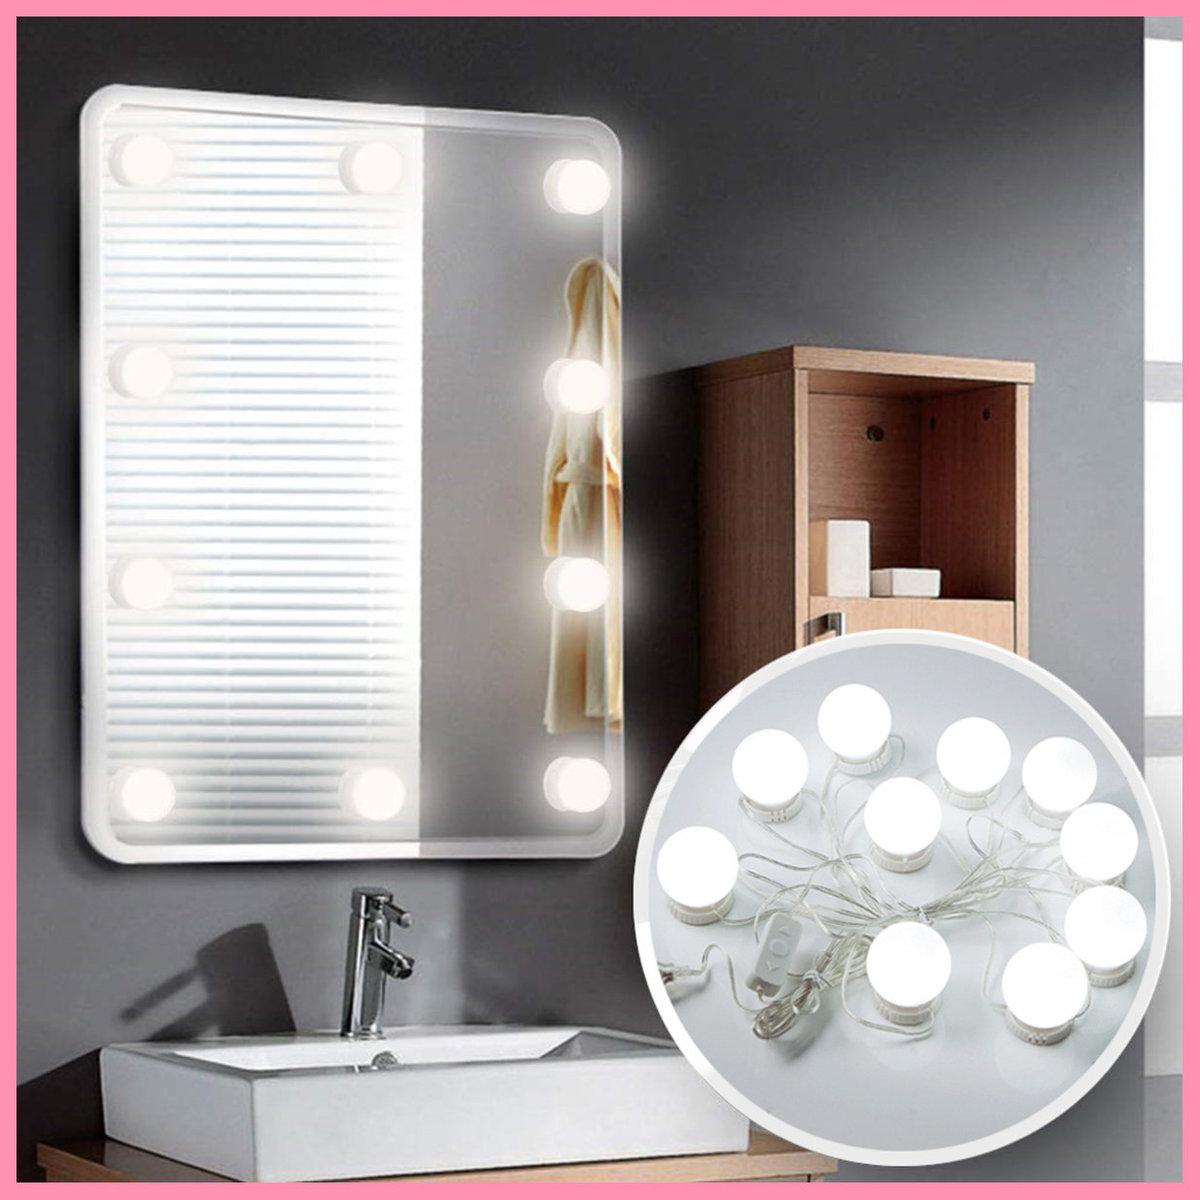 LED鏡前燈 含10個燈泡 舞台化妝前燈